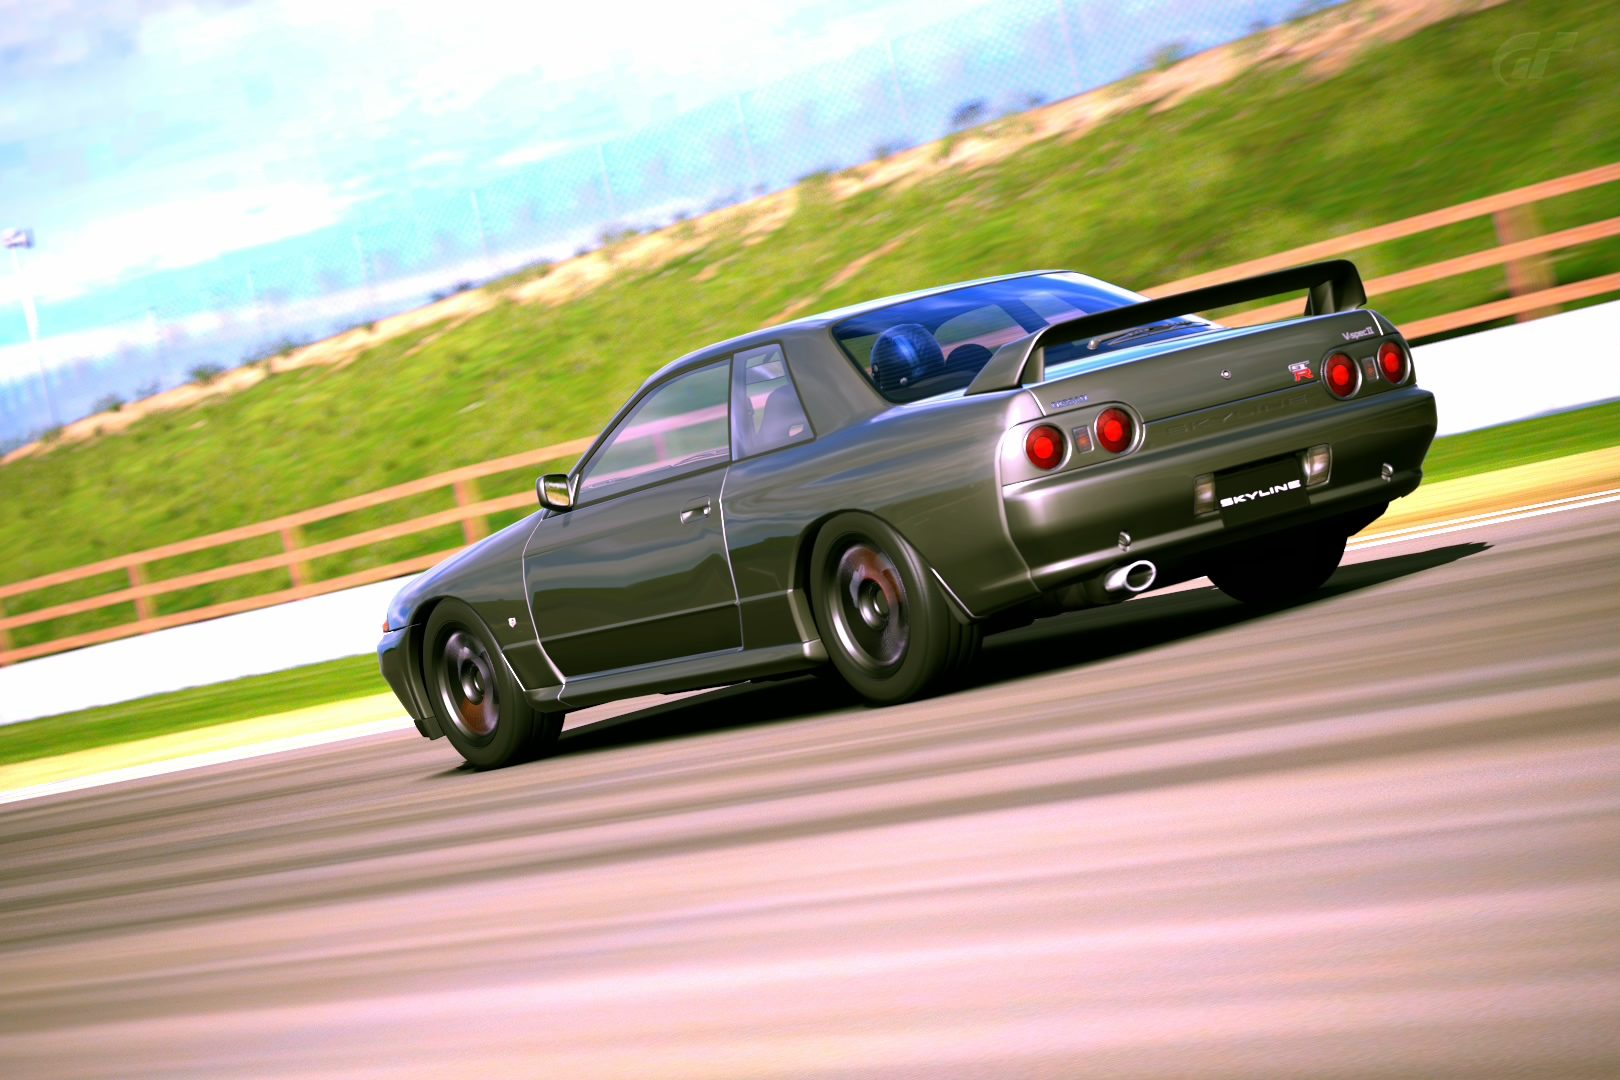 Nissan SKYLINE GT-R V•Spec II (R32) '94 (Car).jpg